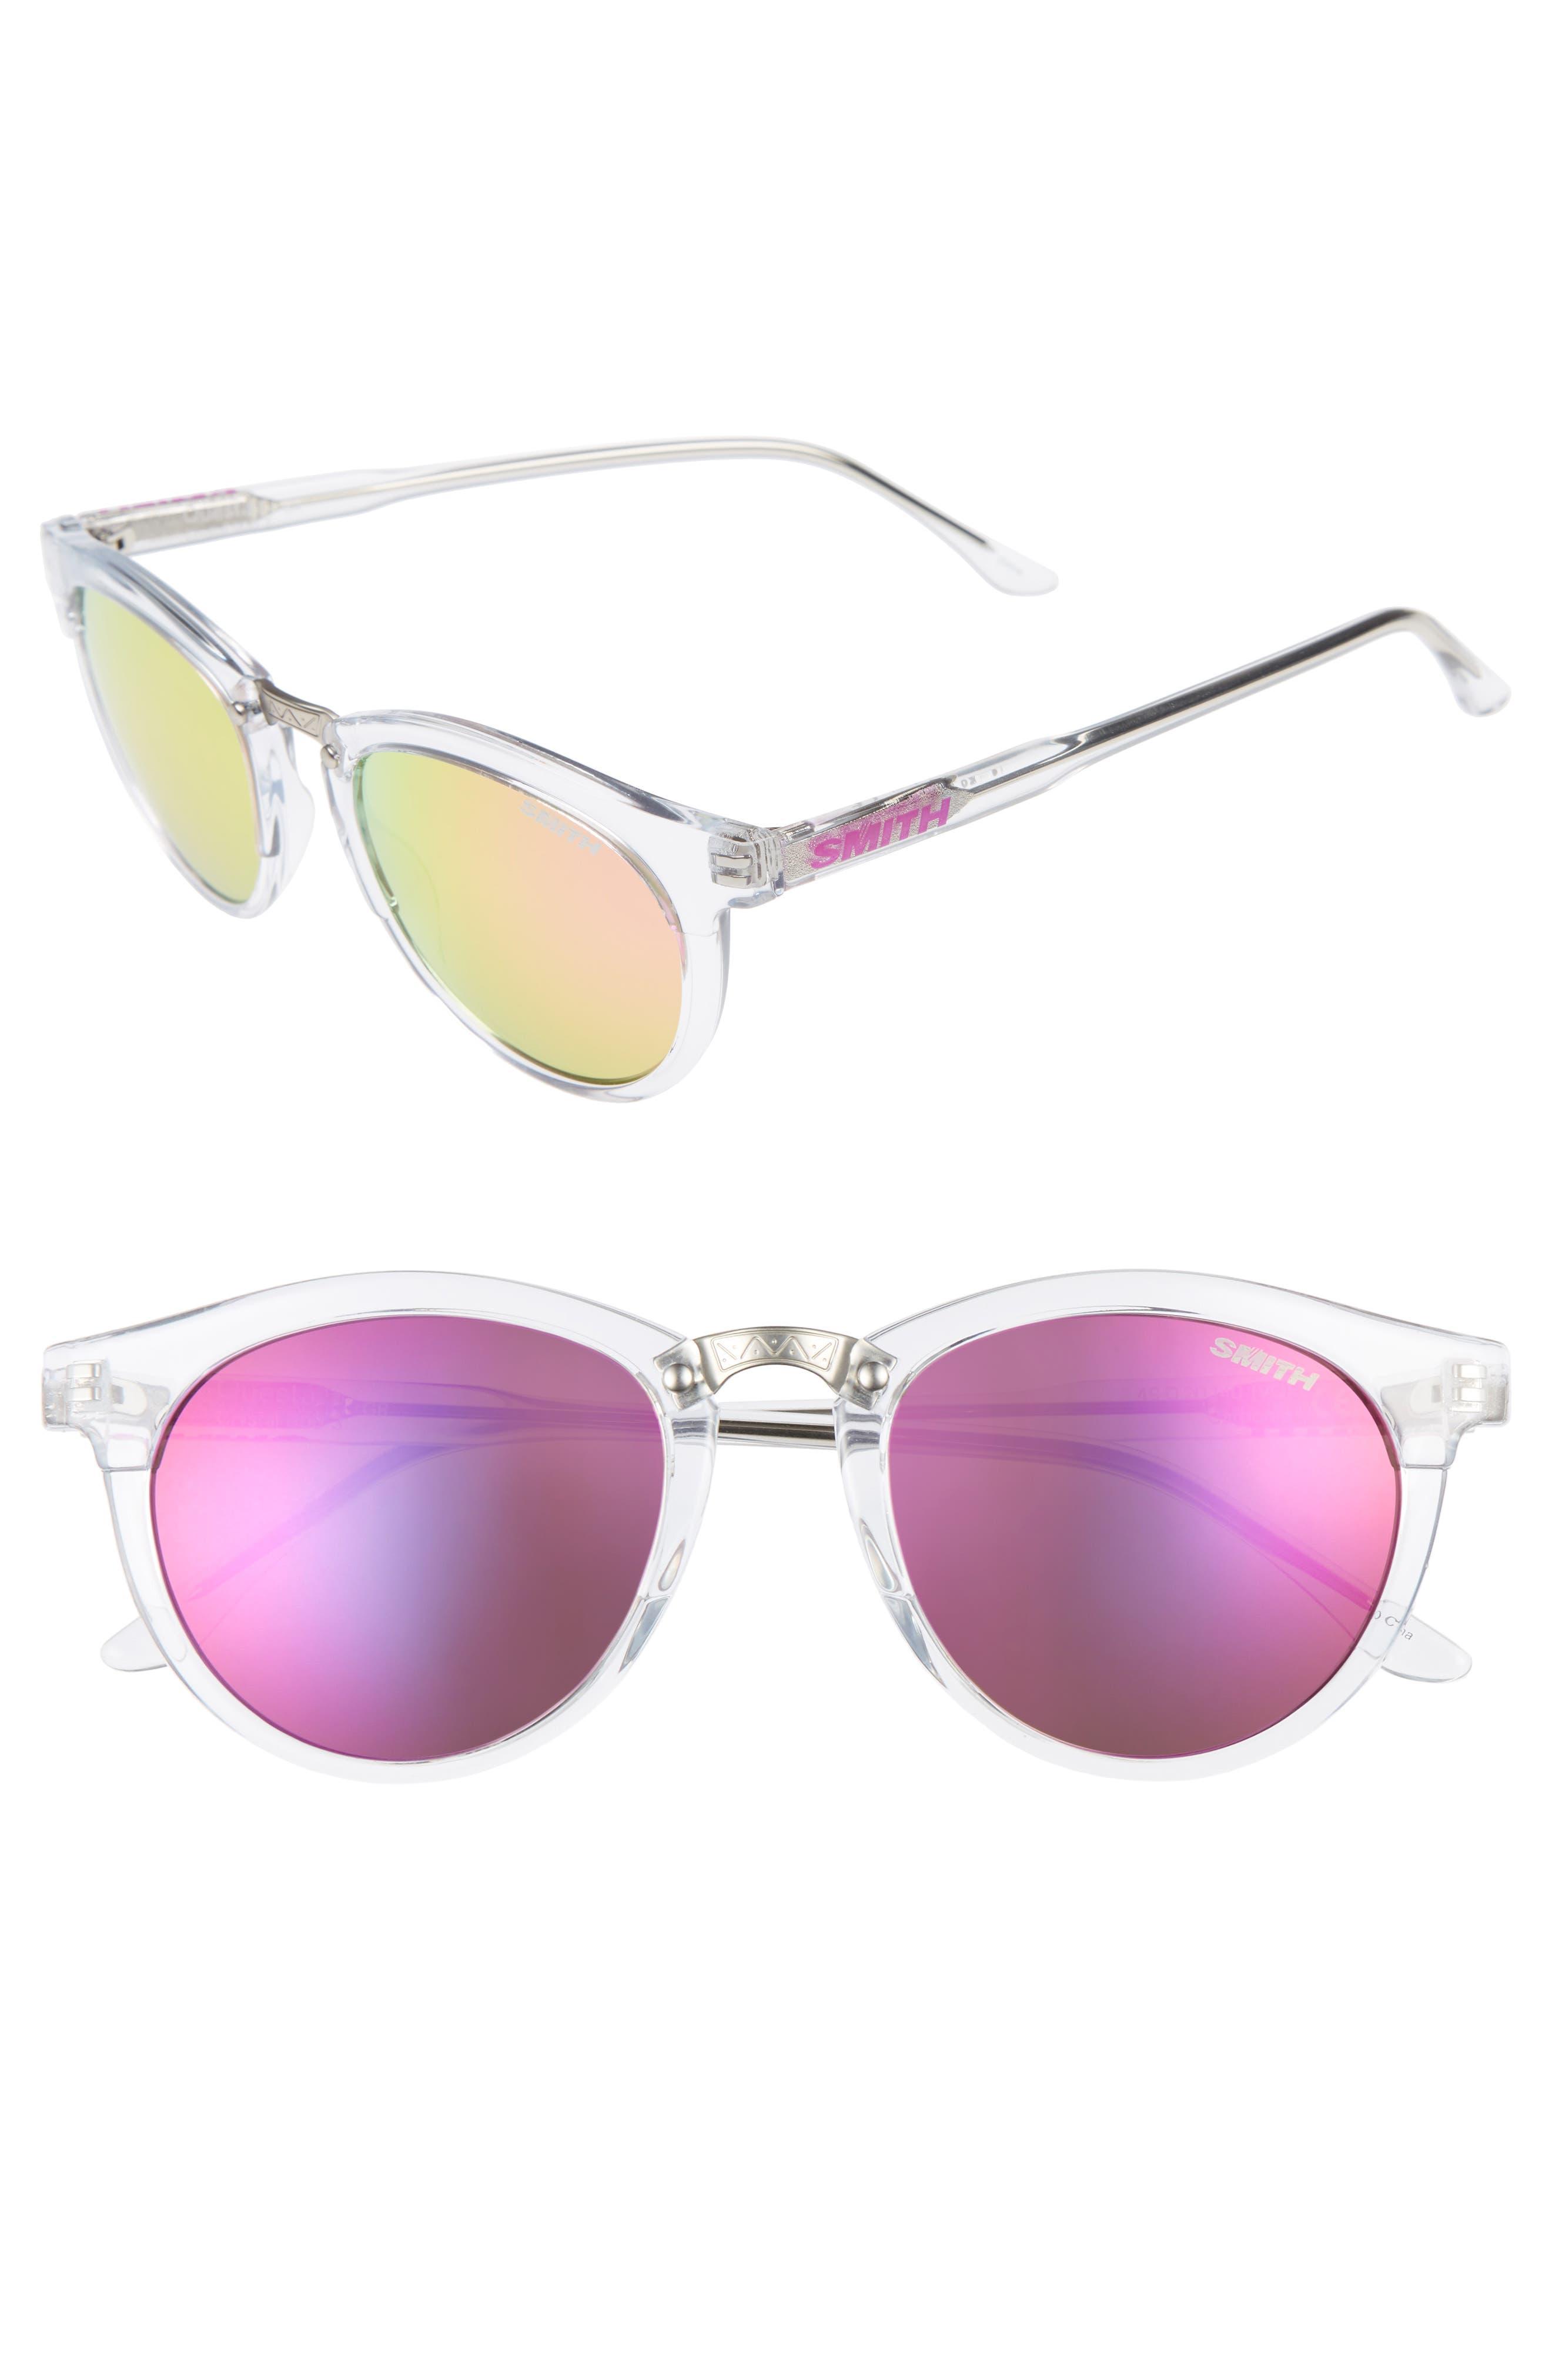 Main Image - Smith Questa 49mm Mirrored Lens Sunglasses